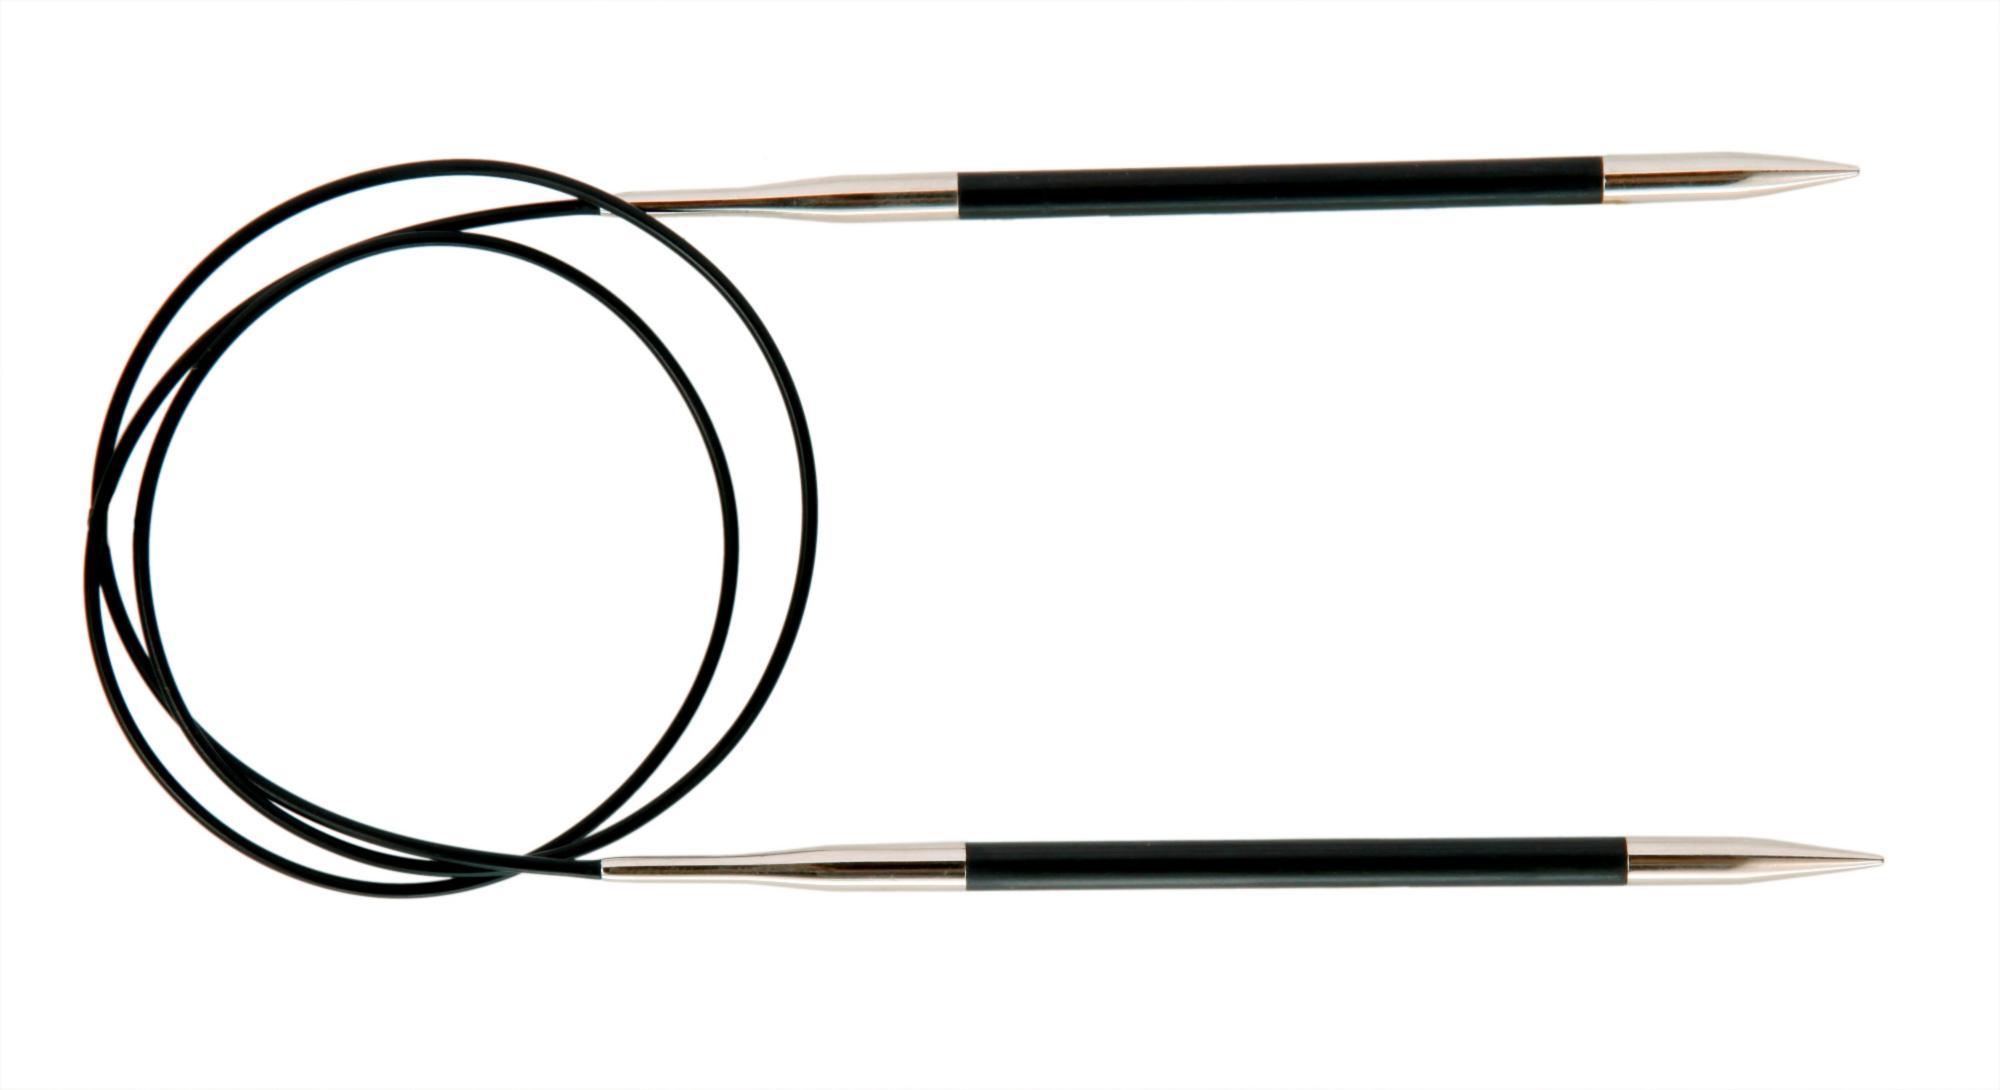 Спицы круговые 60 см Karbonz KnitPro, 41167, 3.75 мм